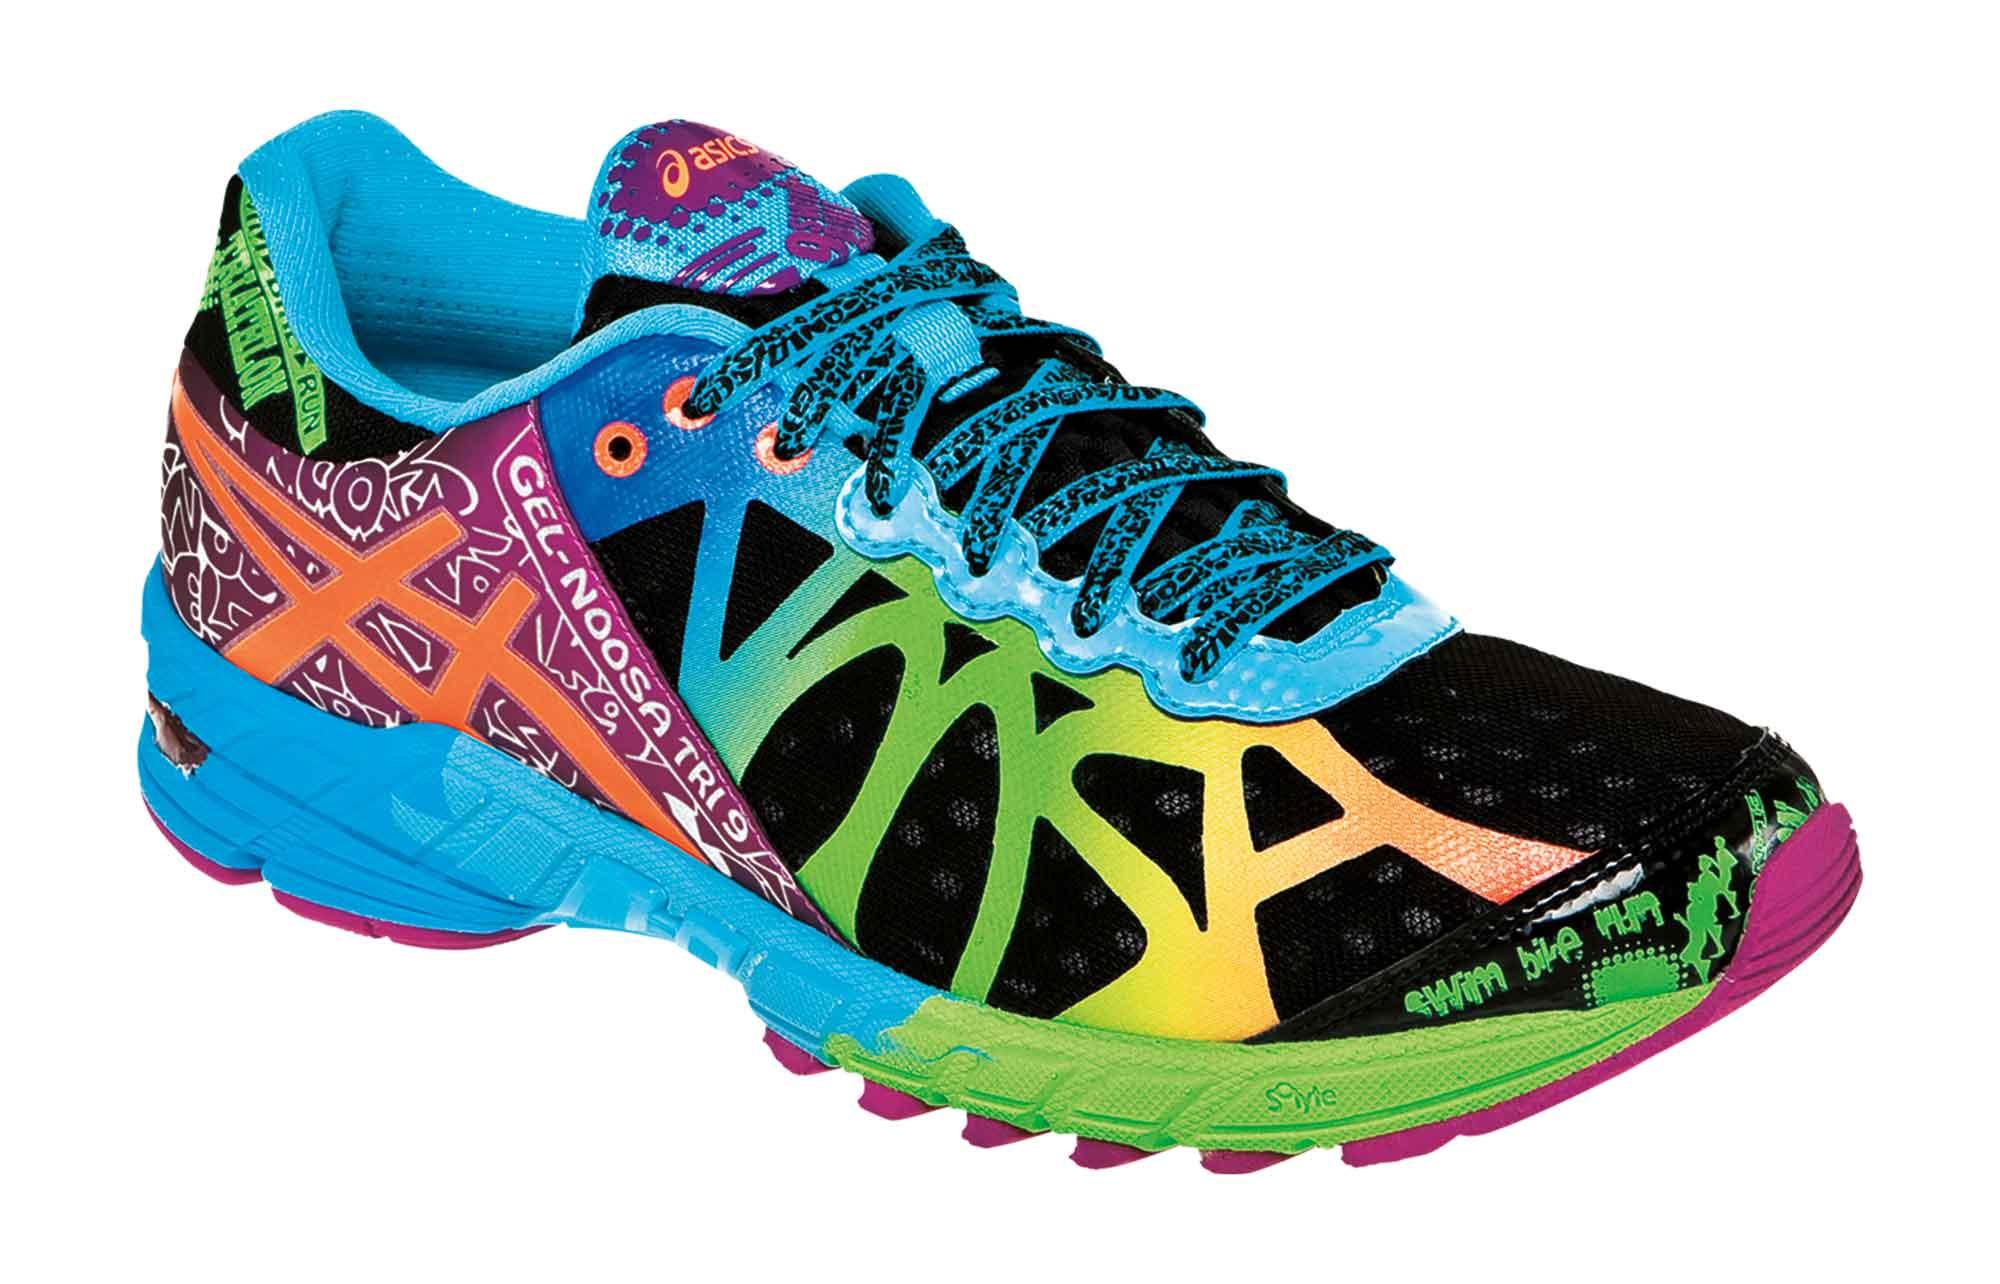 Asics Gel Noosa Tri 9 Shoes R Amp A Cycles